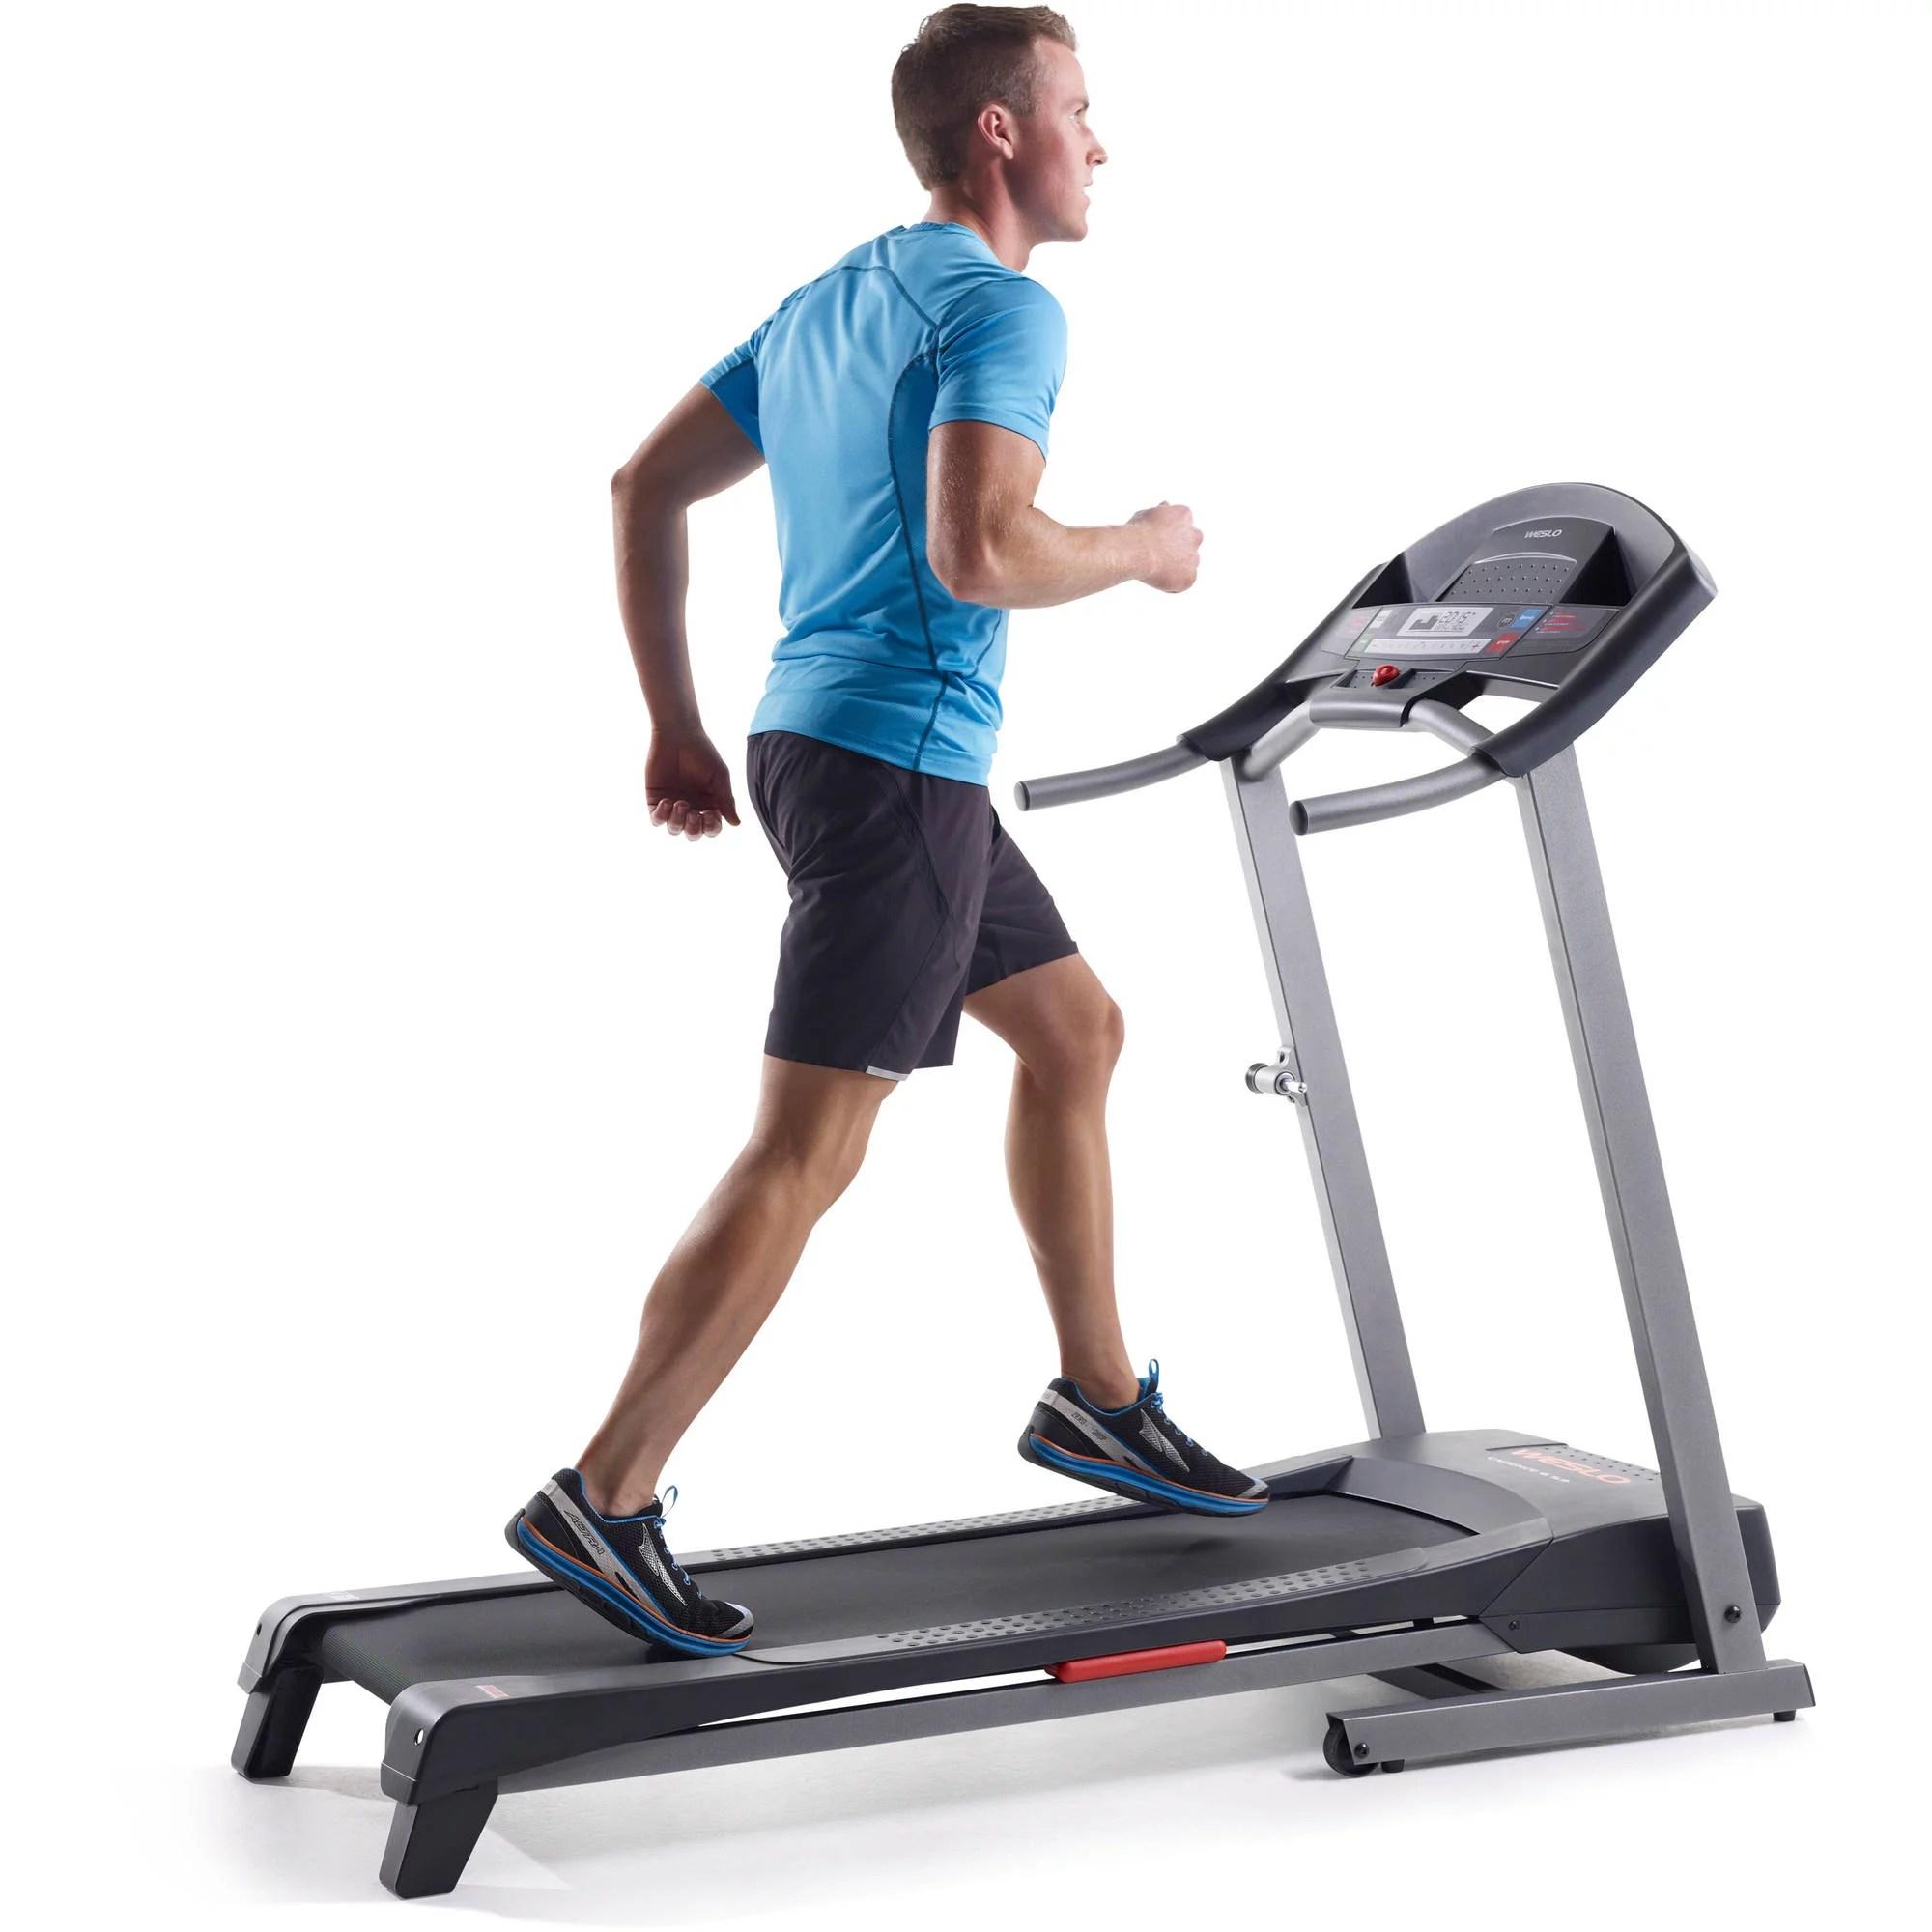 medium resolution of weslo cadence g 5 9i folding treadmill walmart com dc motor controller scr diagram permanent magnet electric treadmill motor wiring diagram